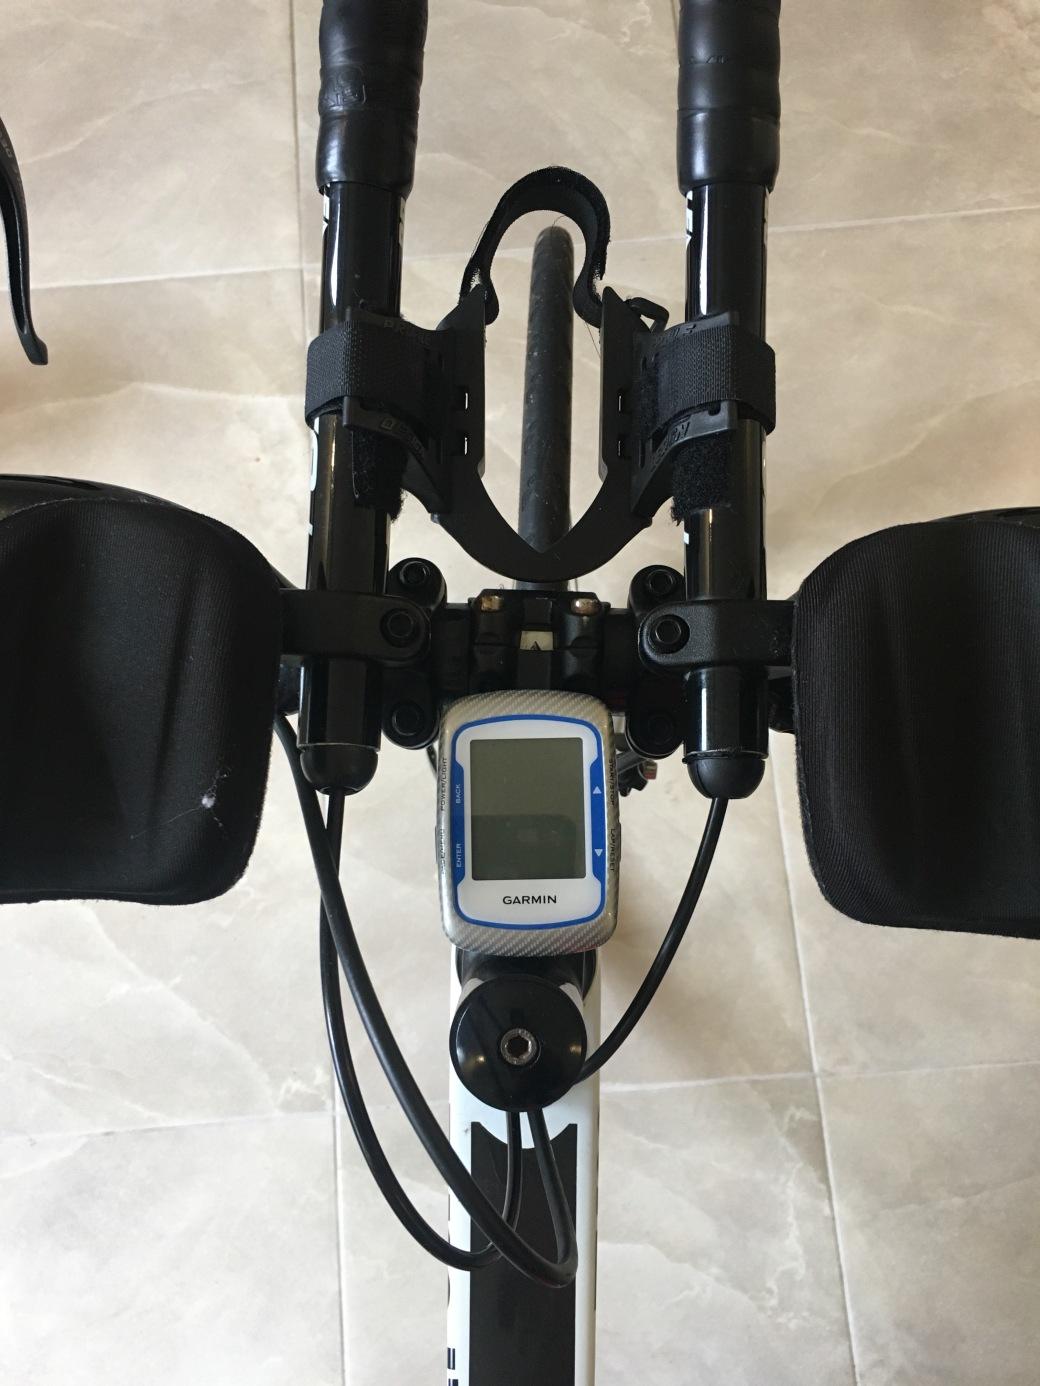 Garmin Edge 500, installed